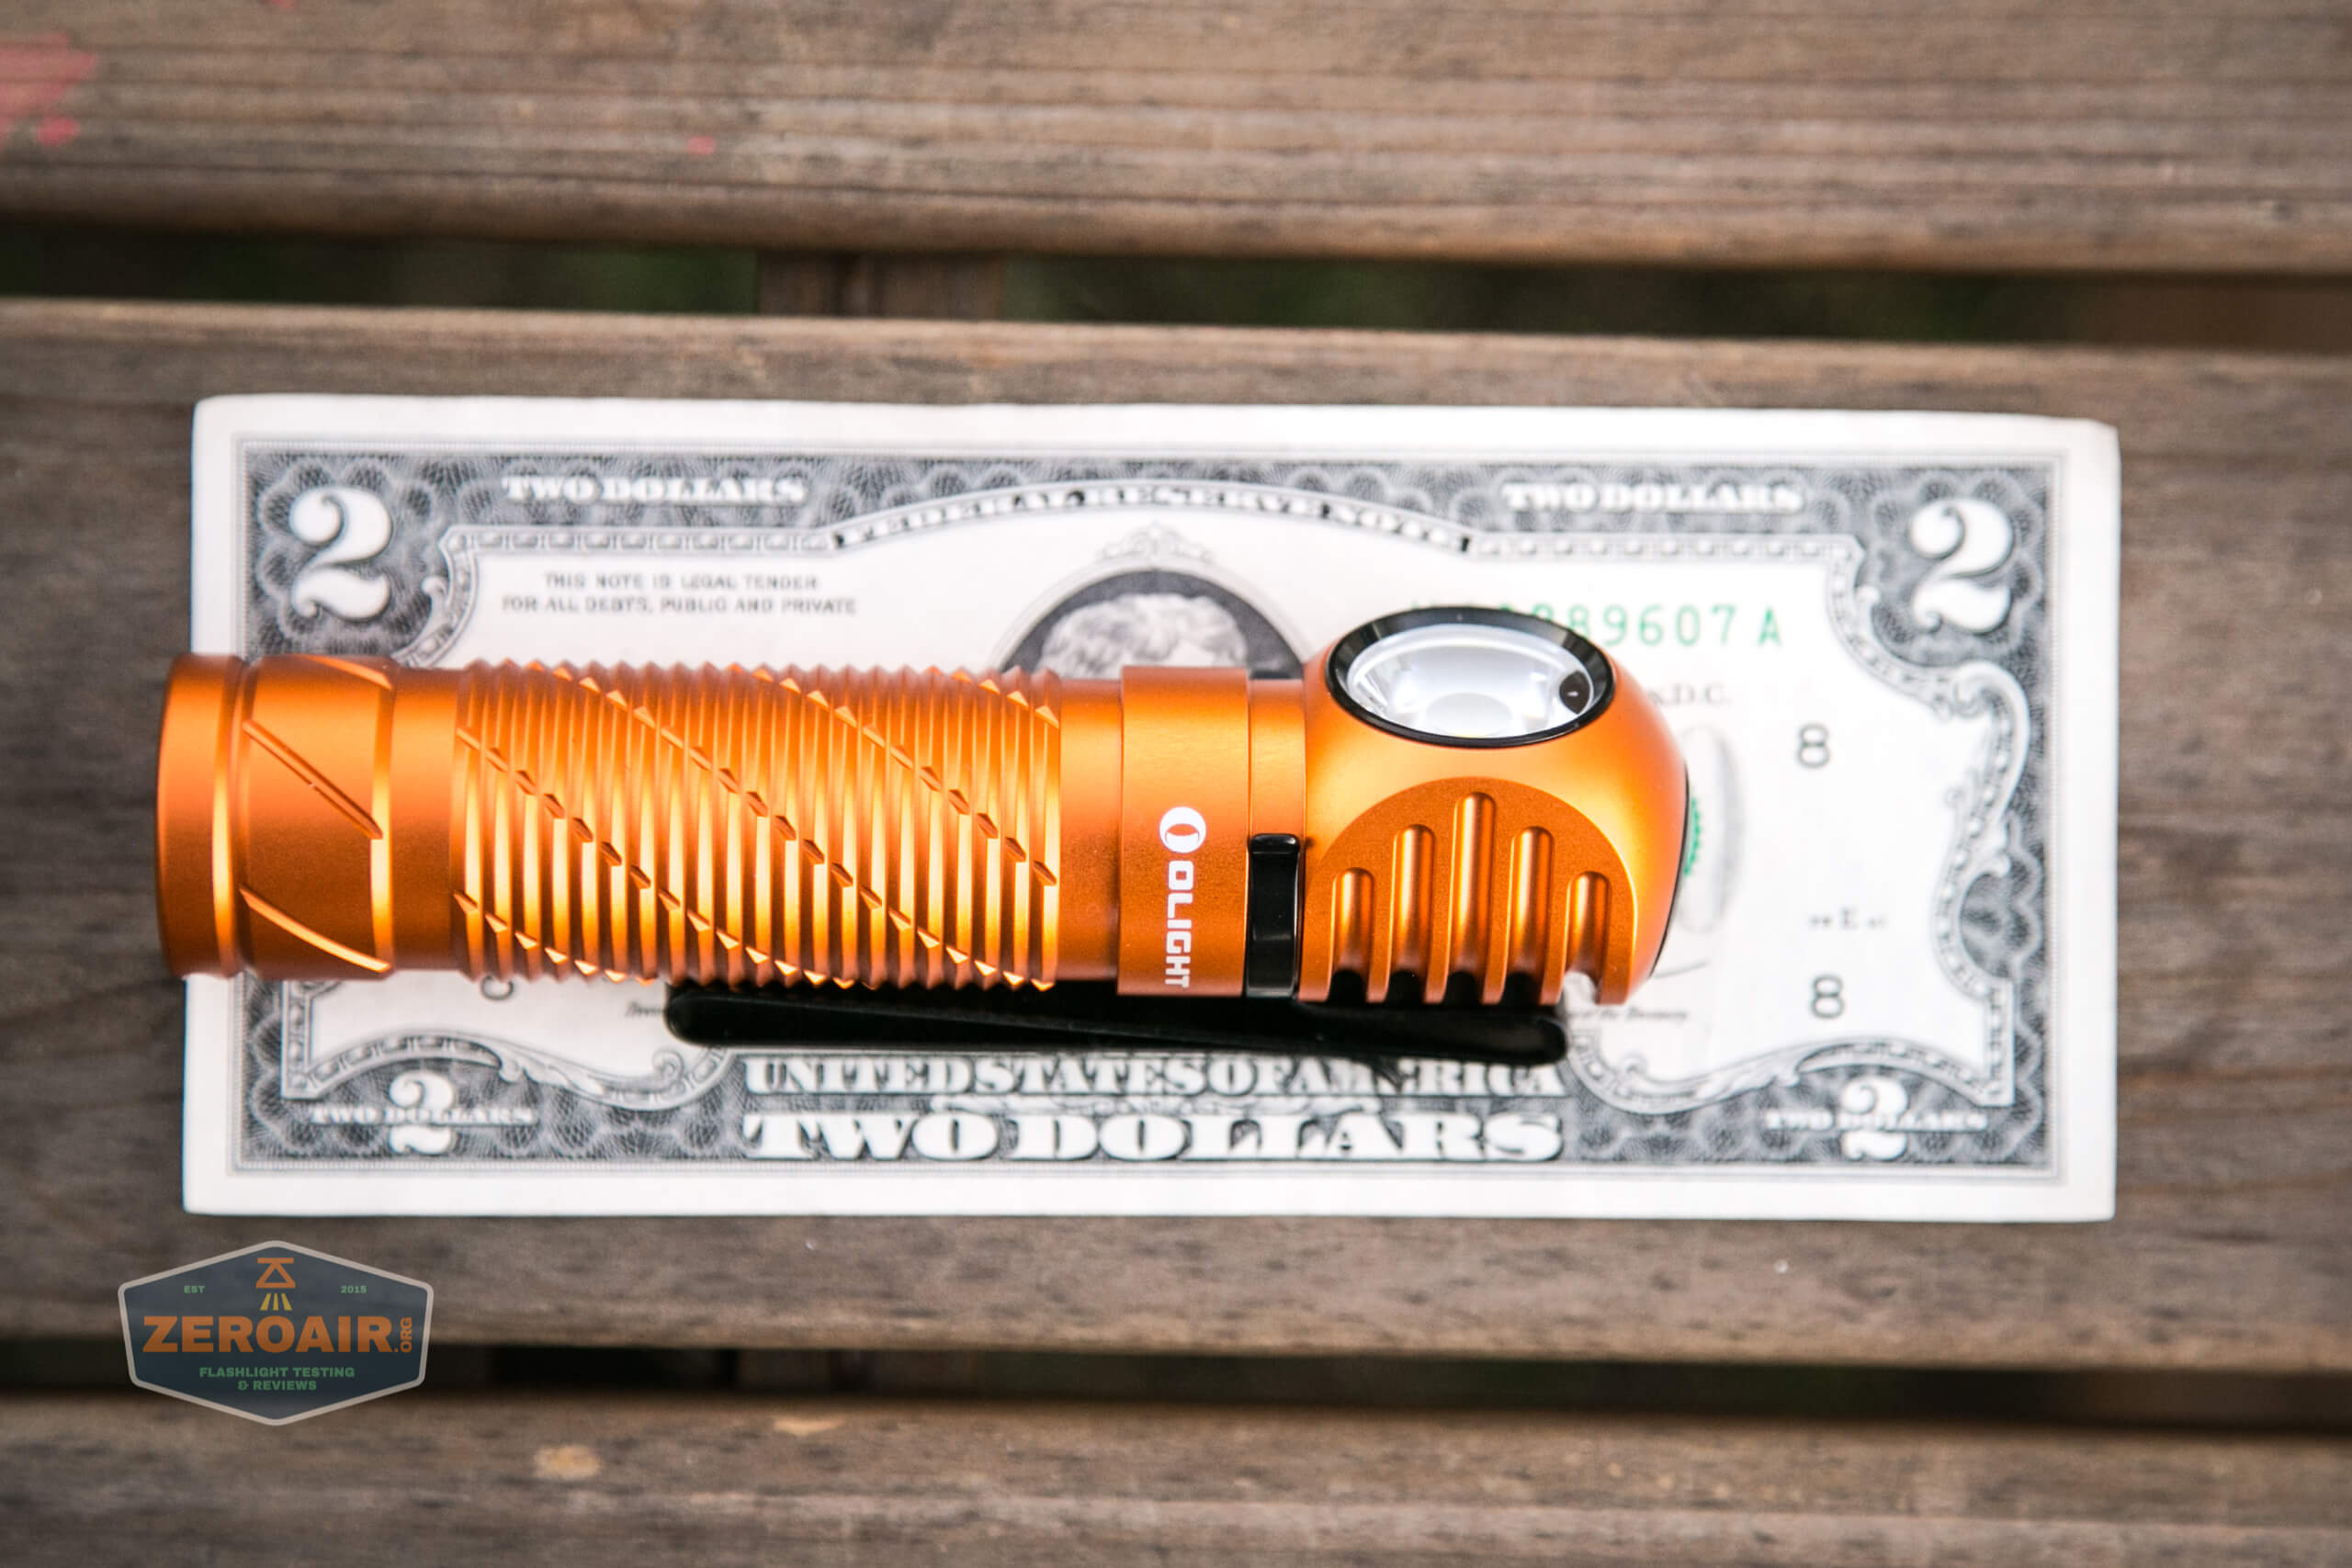 olight perun 2 21700 headlamp orange on two dollar bill